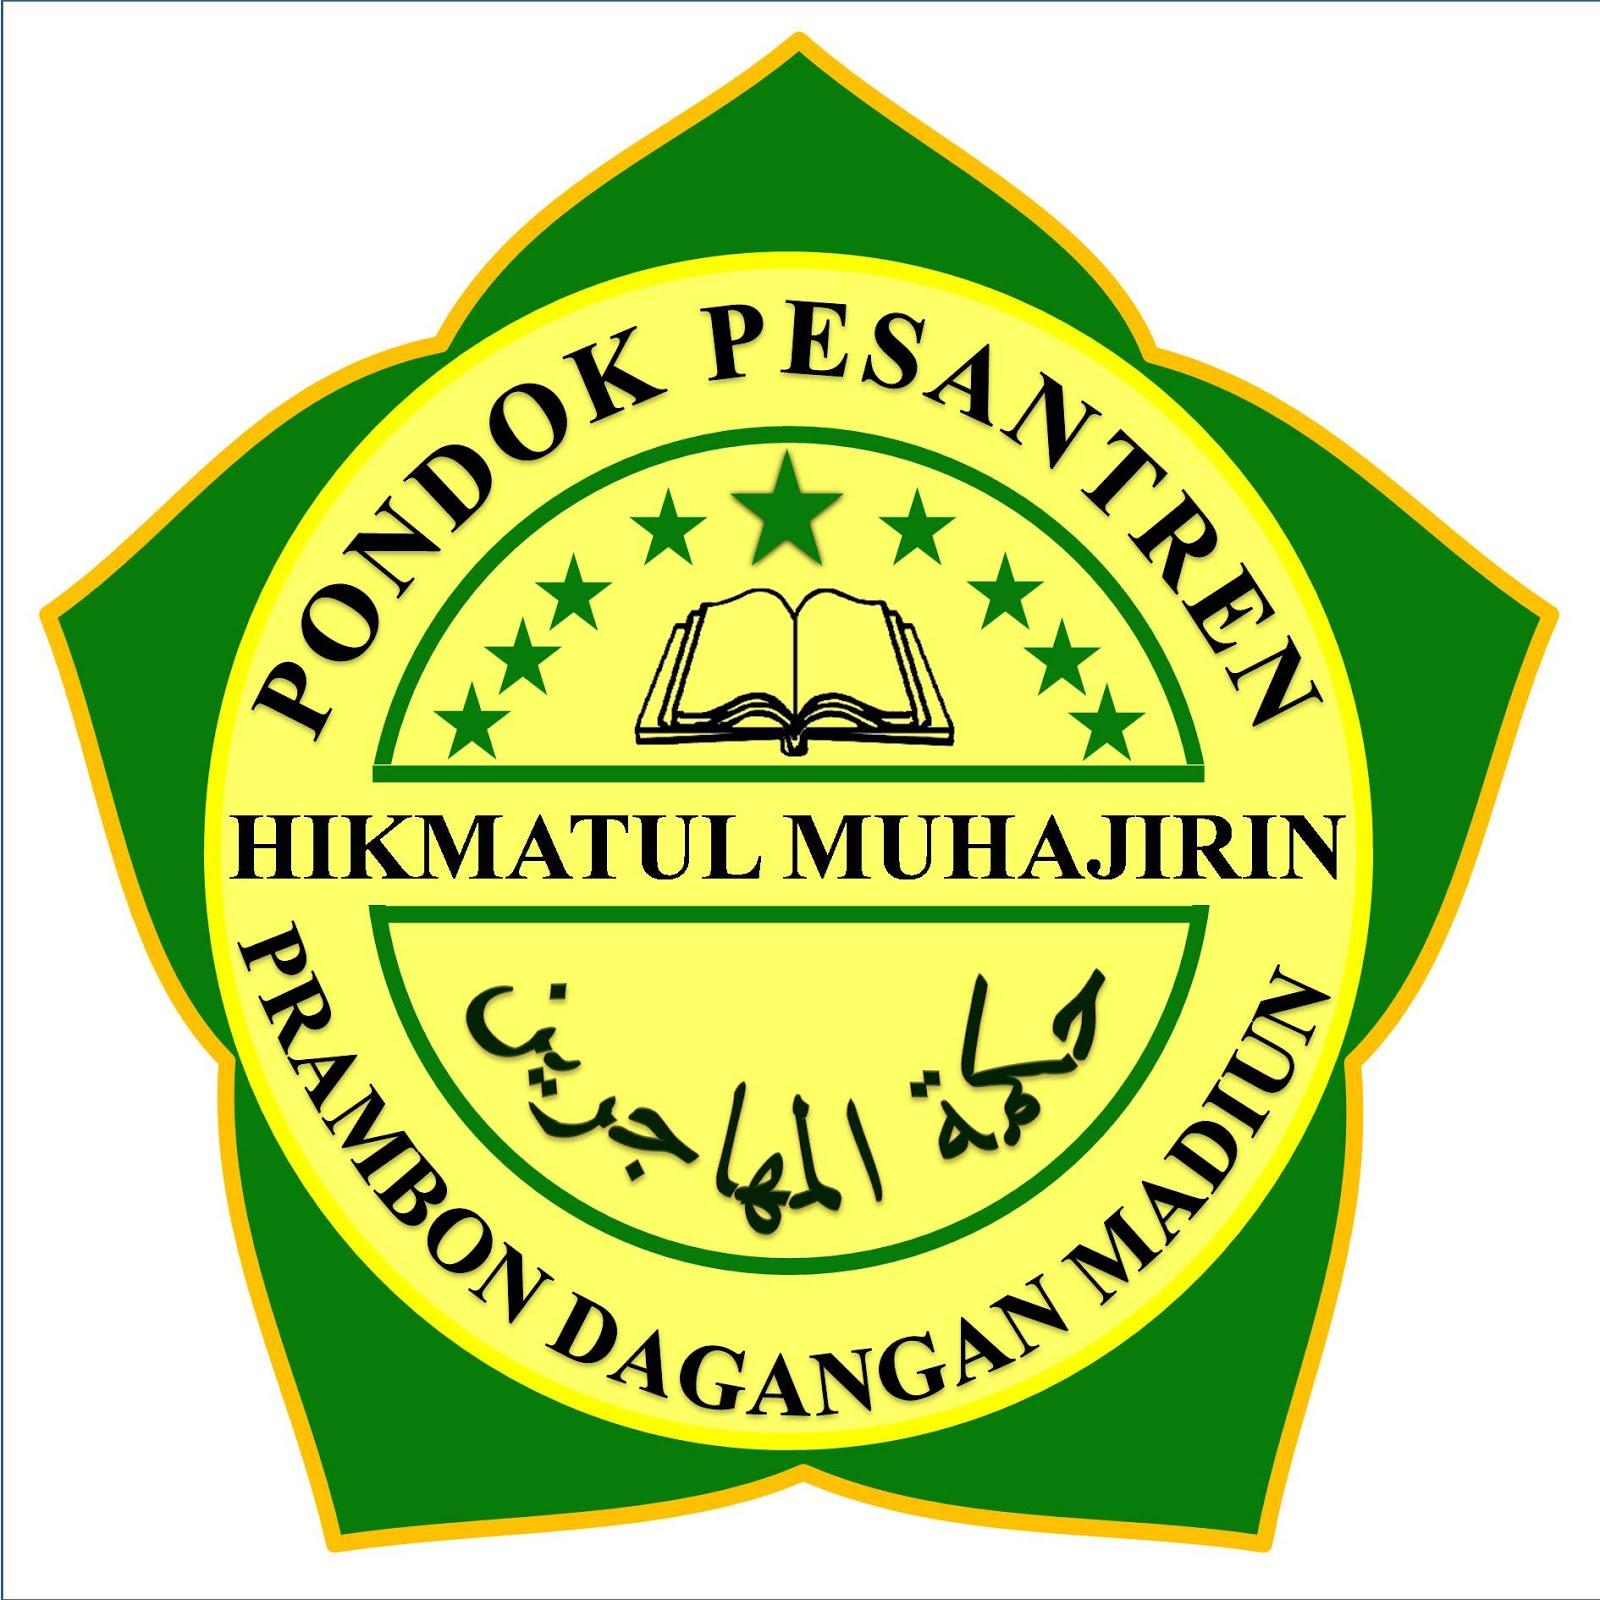 Pondok Pesantren Hikmatul Muhajirin